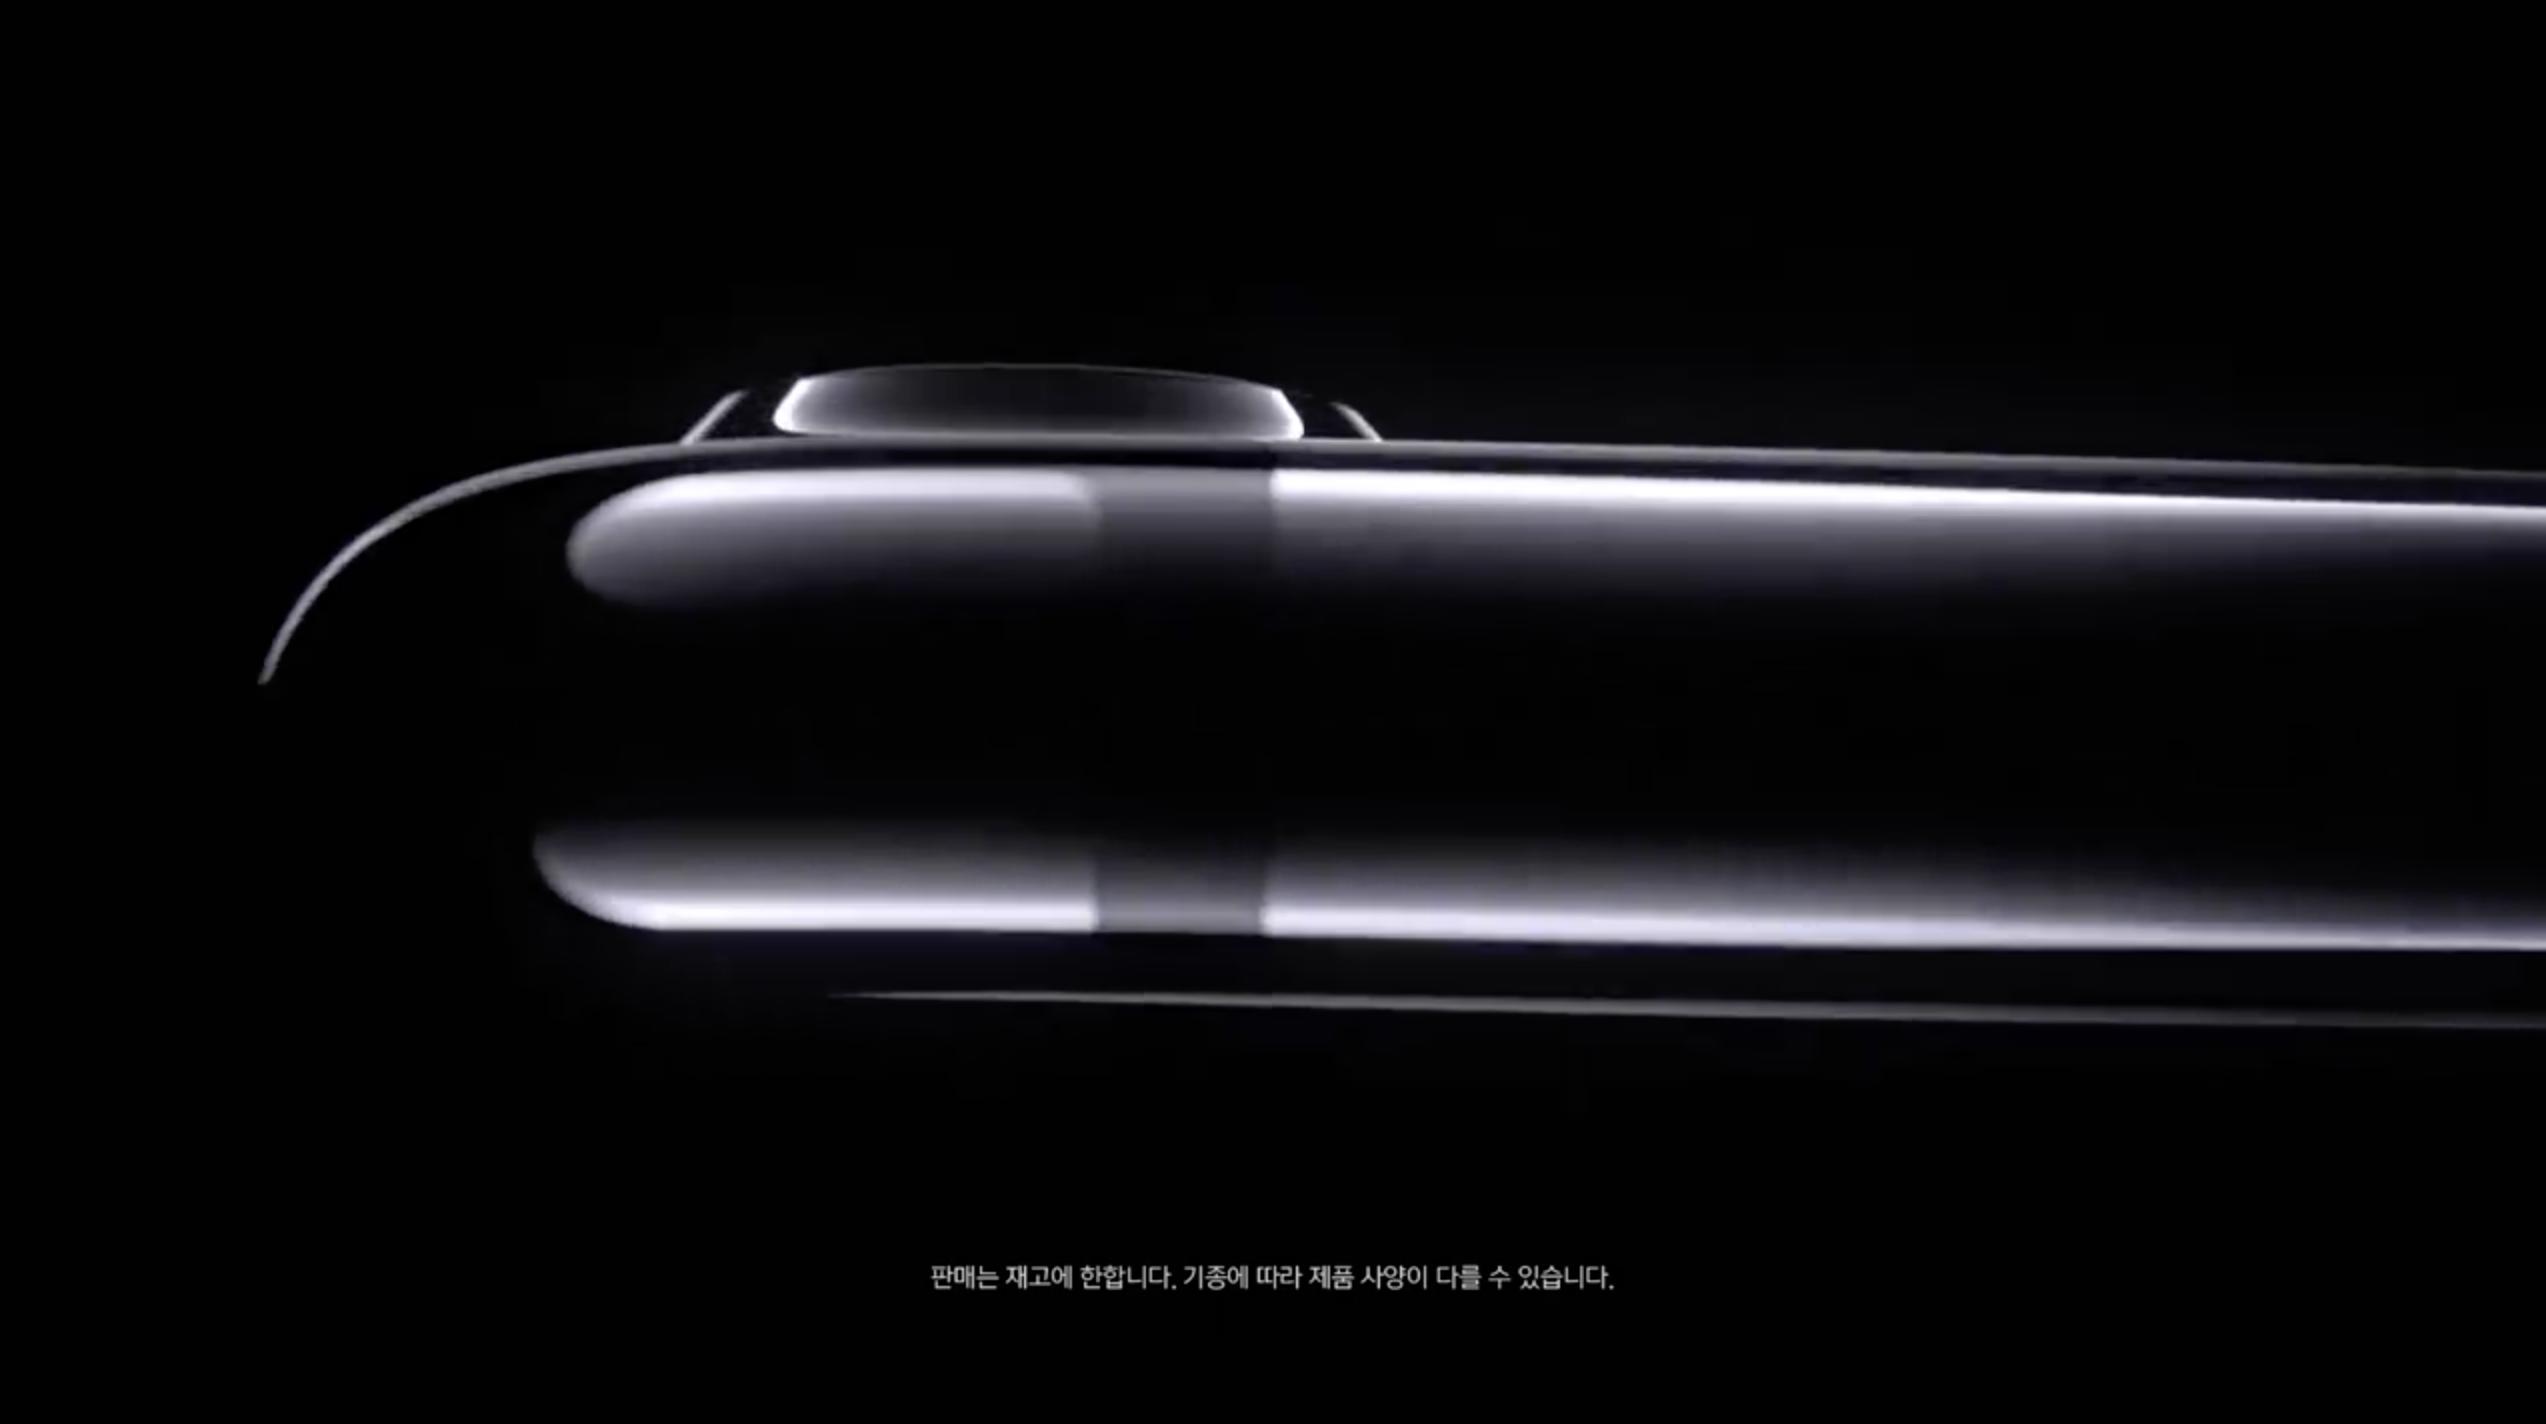 iPhone 7 – A10 Fusion 칩 2016.10.21, Apple 공식 영상